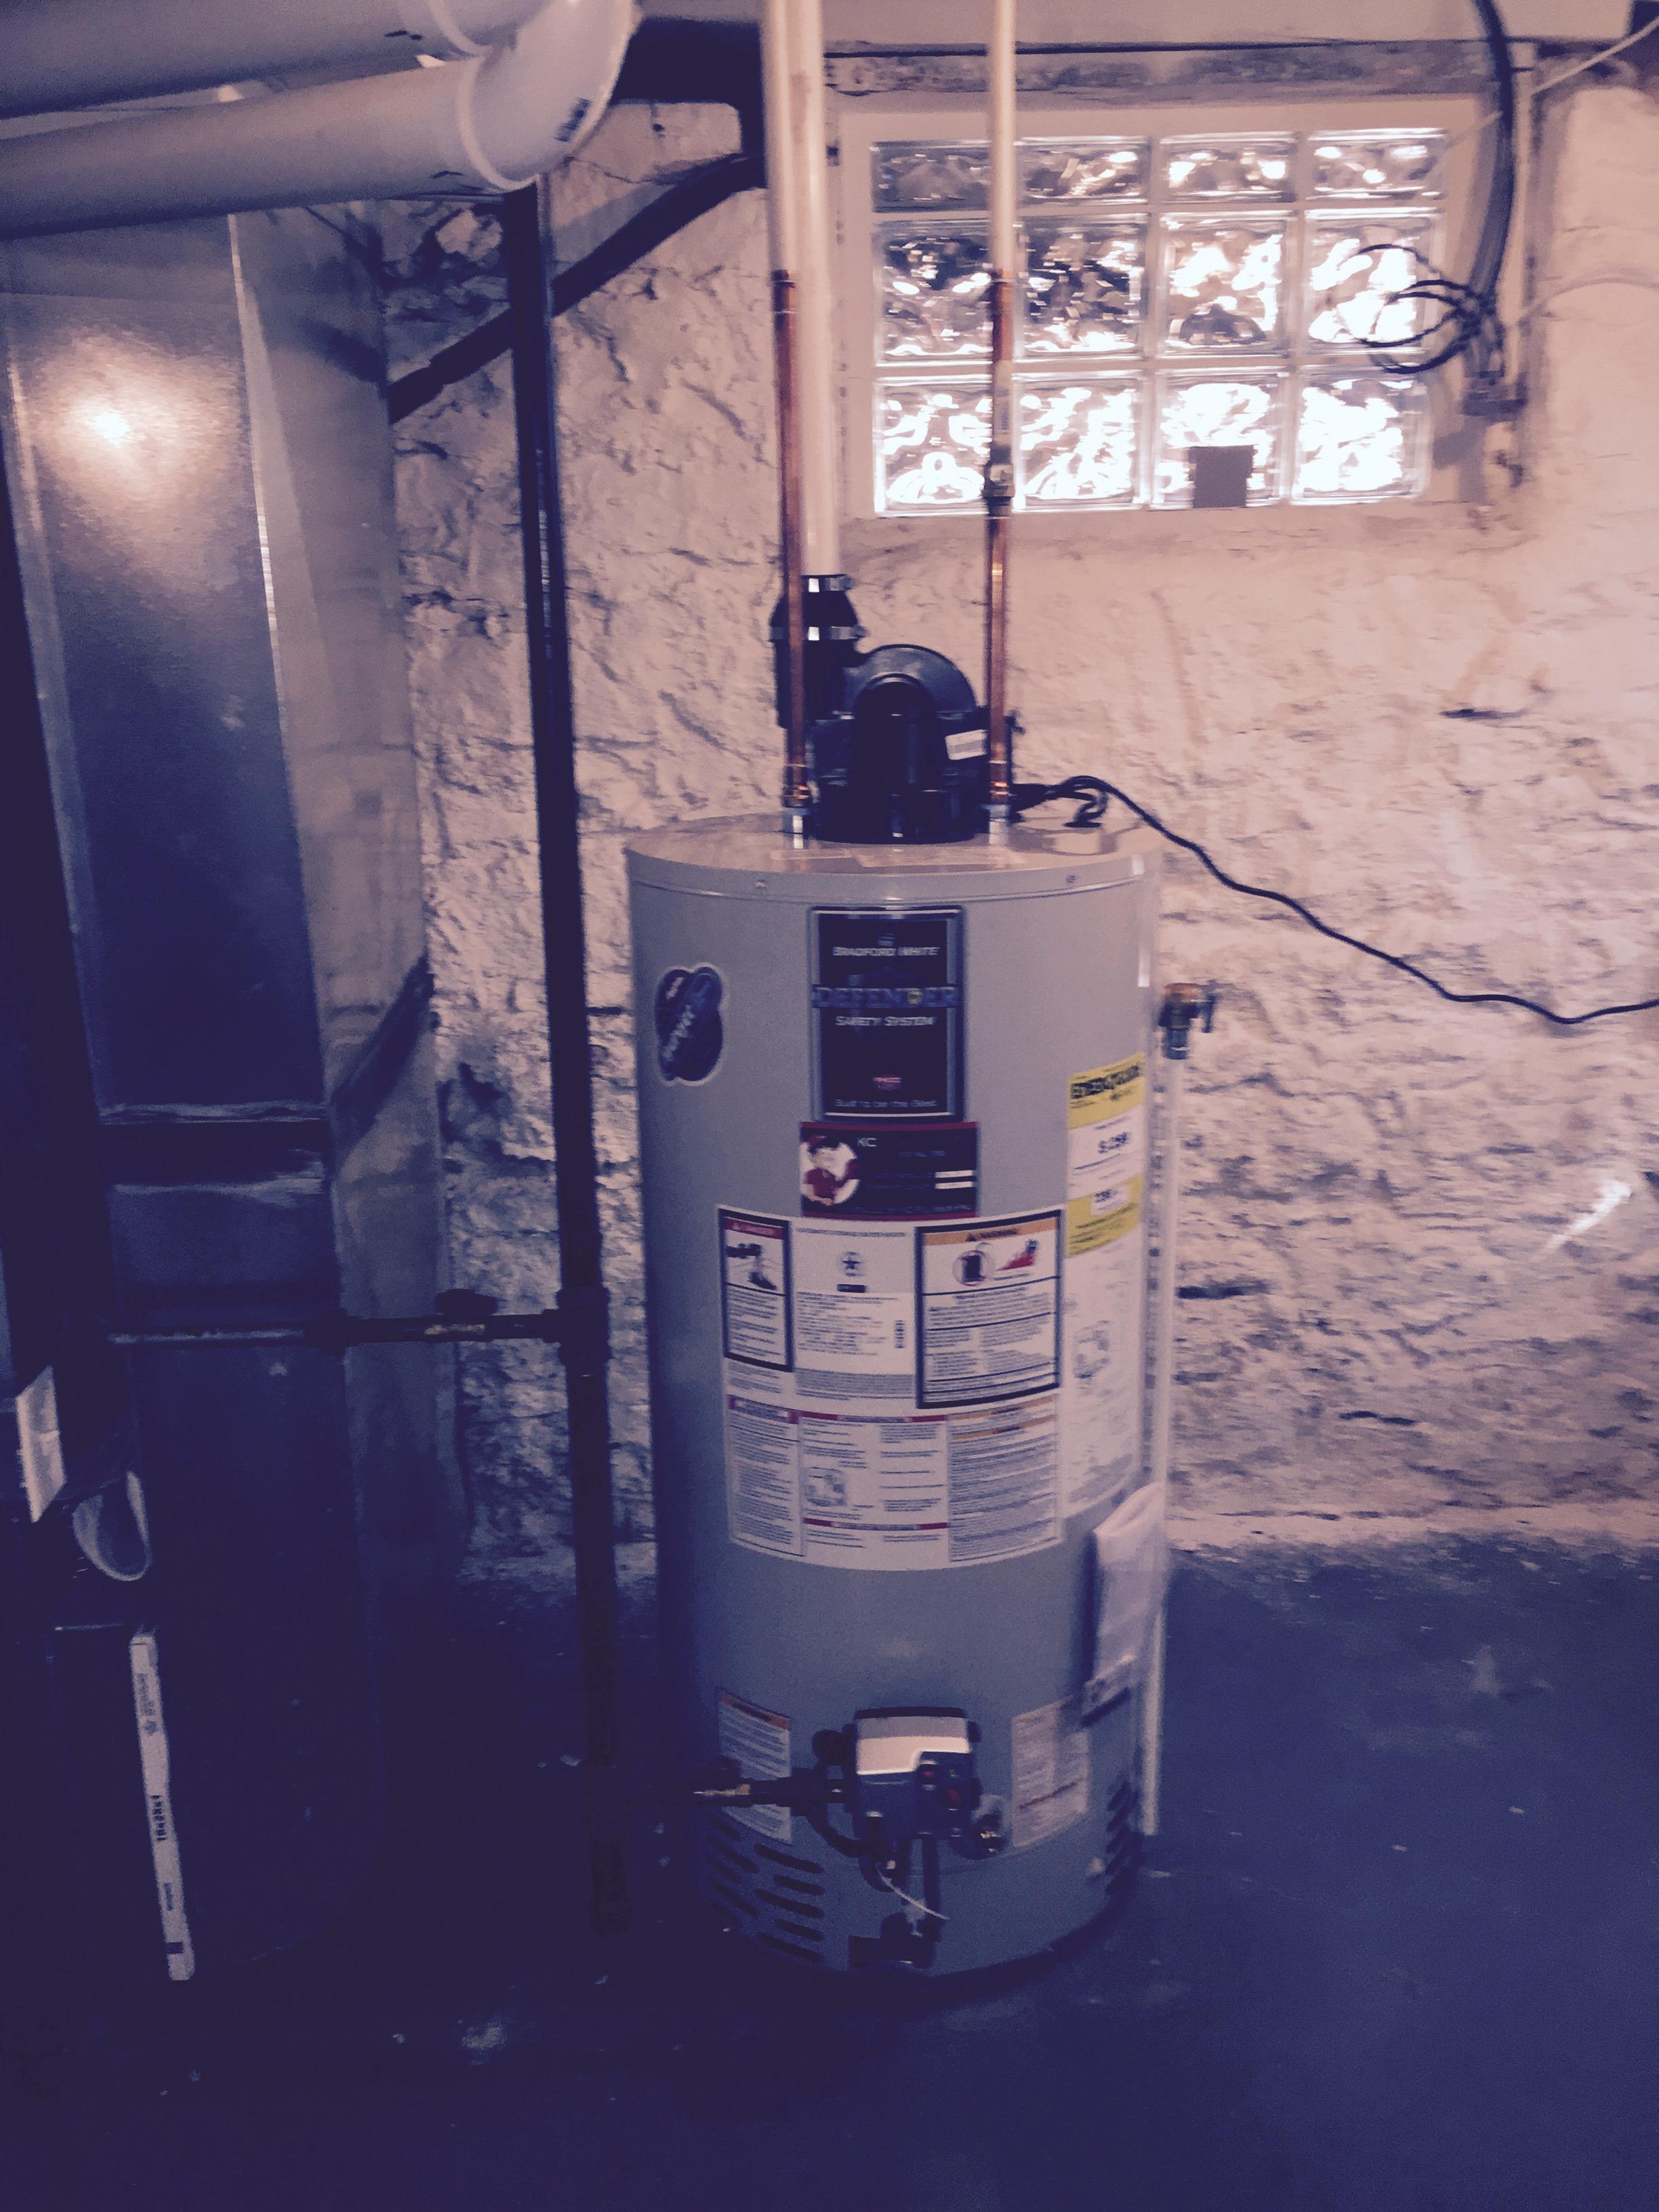 B venting a hot water heater -  Ks Power Vent Water Heater In Kansas City Kansas